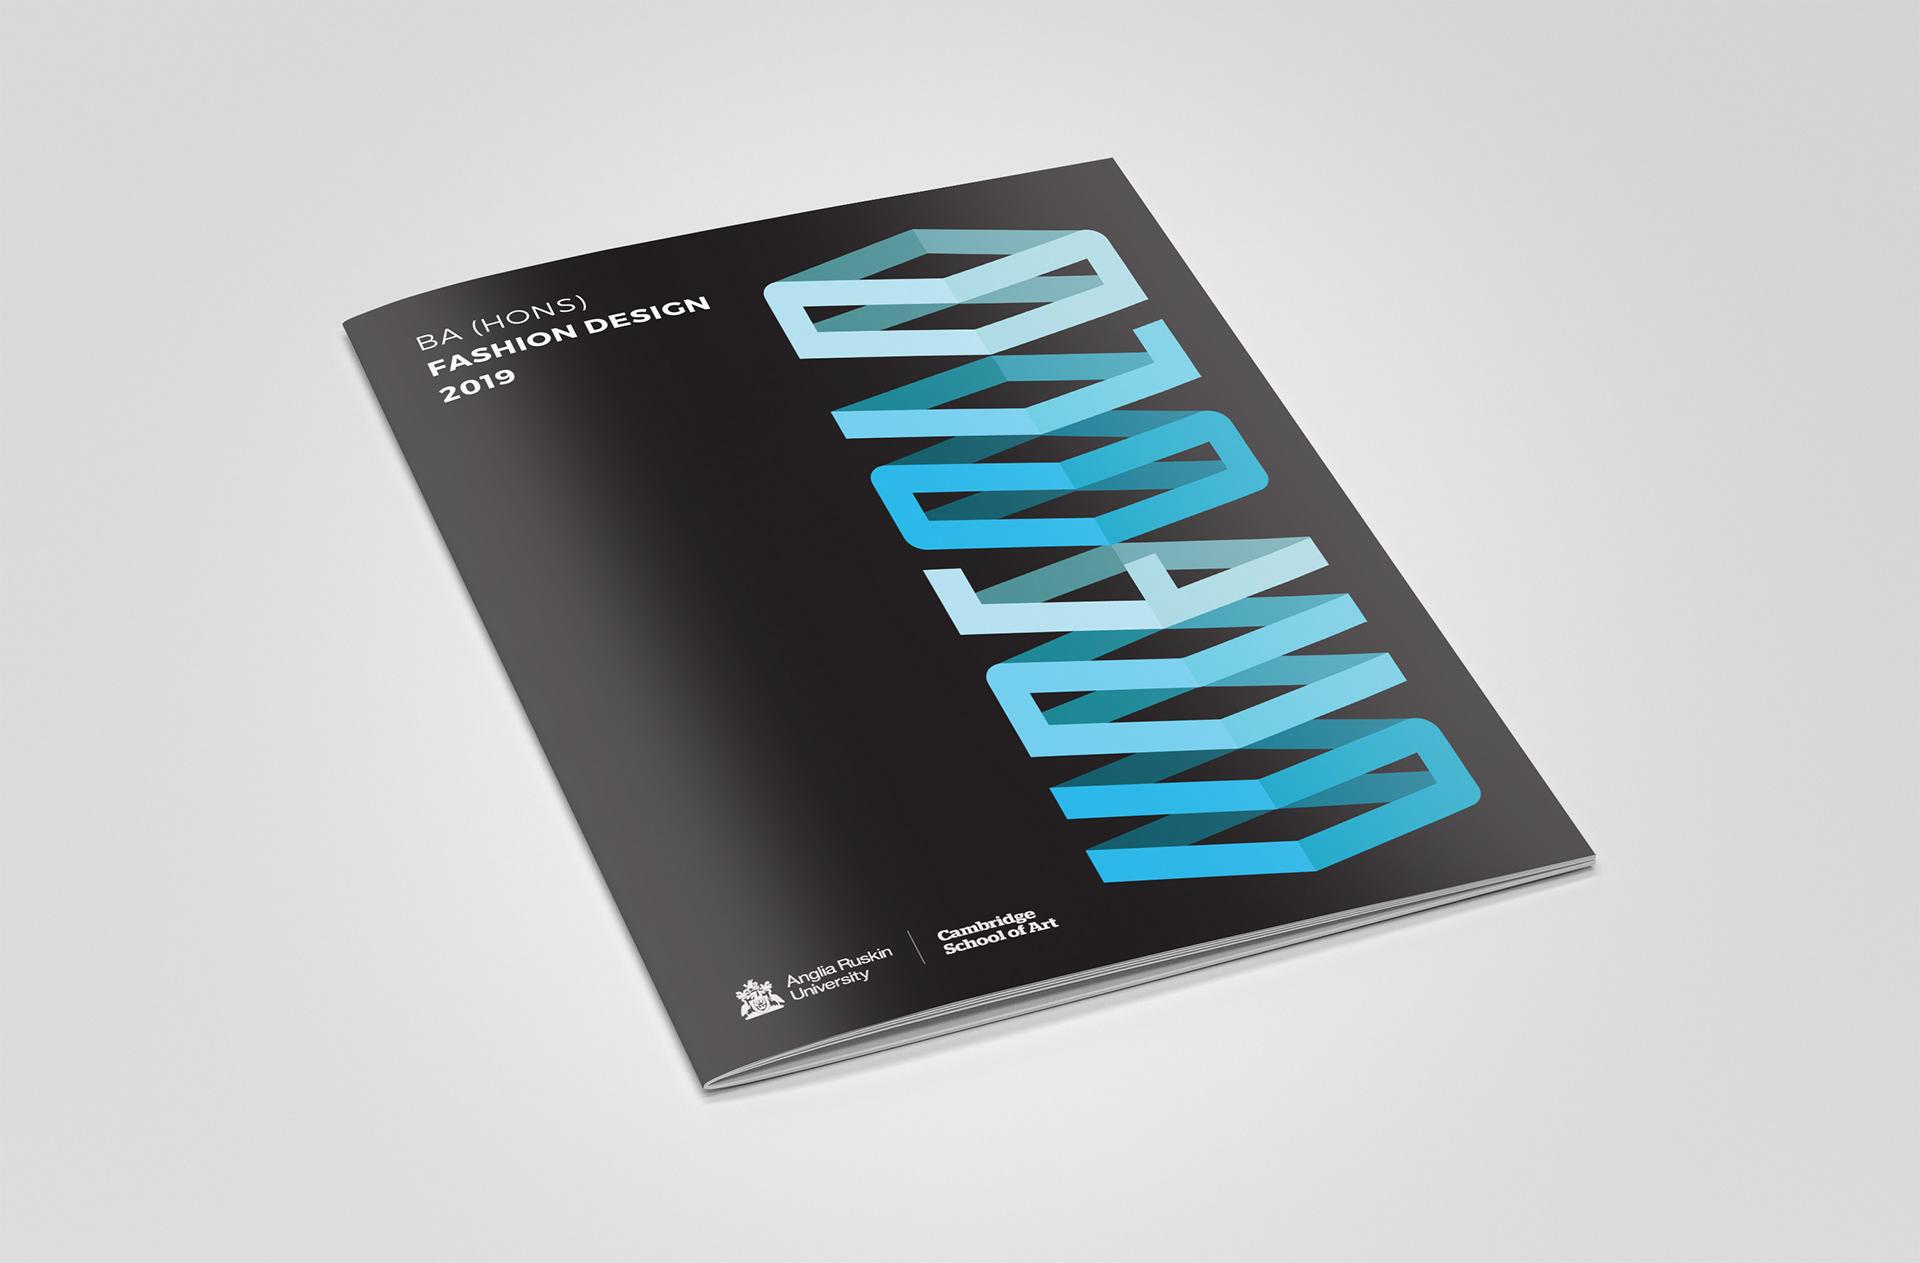 Javeria Sheikh Editorial Design Cambridge School Of Art